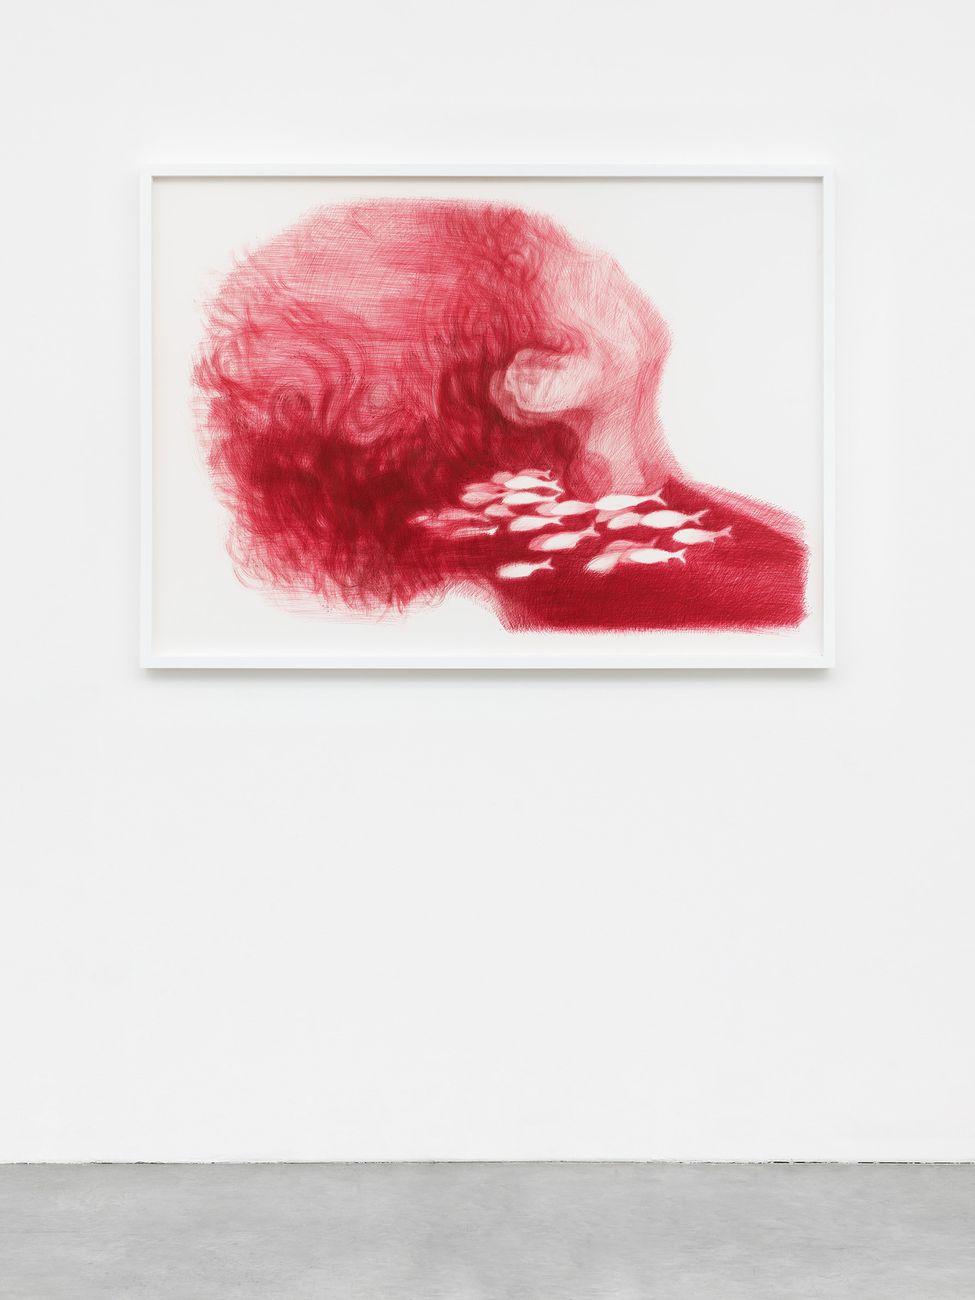 Diego Perrone, Senza titolo, 2020. Courtesy dell'artista e Massimo De Carlo, Milano, Londra, Hong Kong